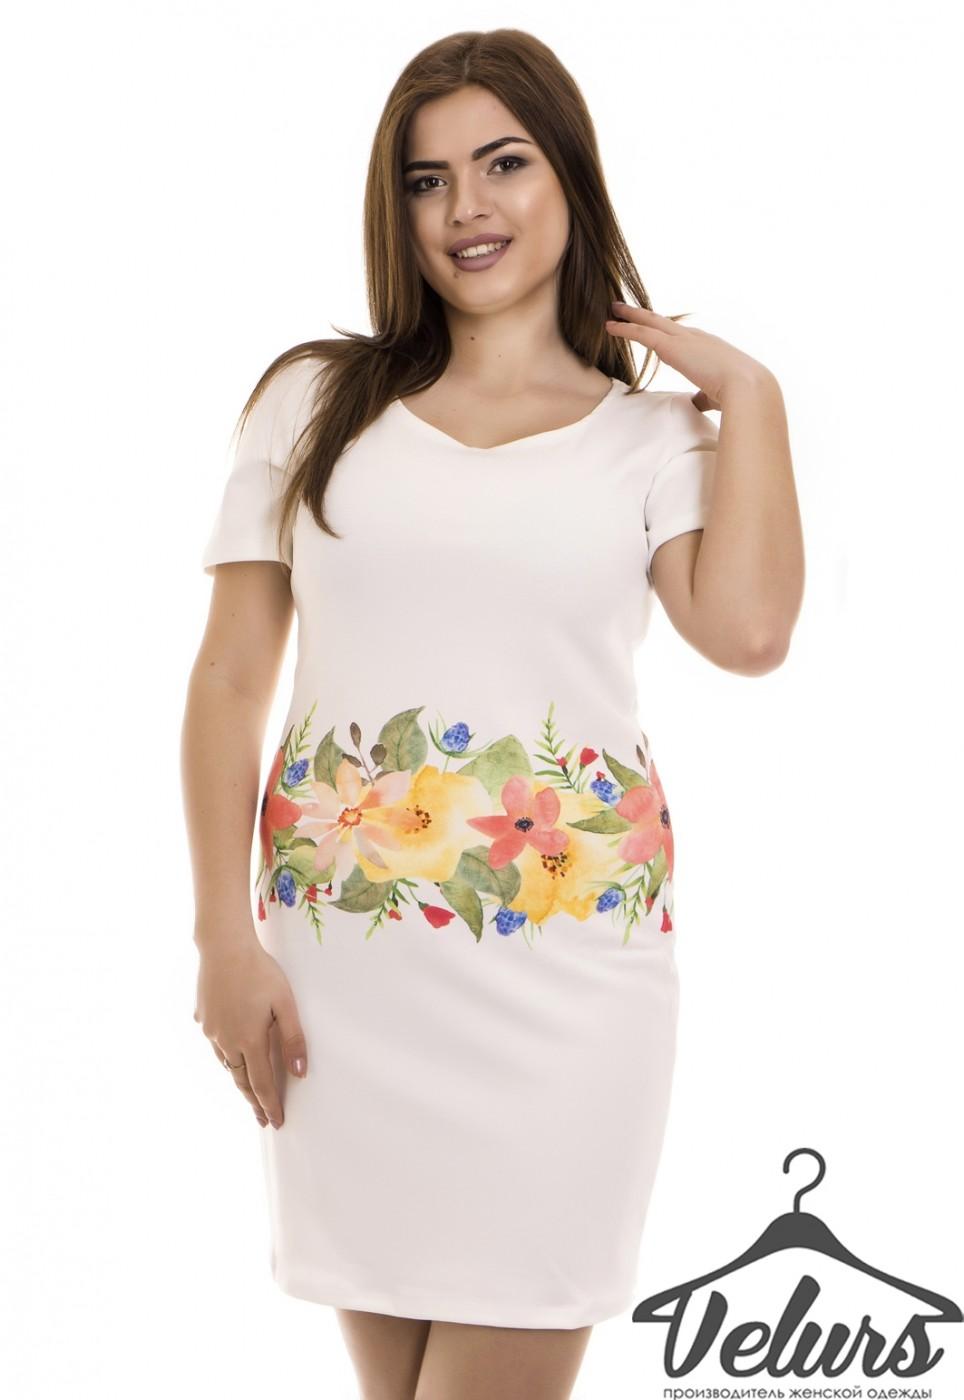 Velurs: Платье 212126 - фото 26